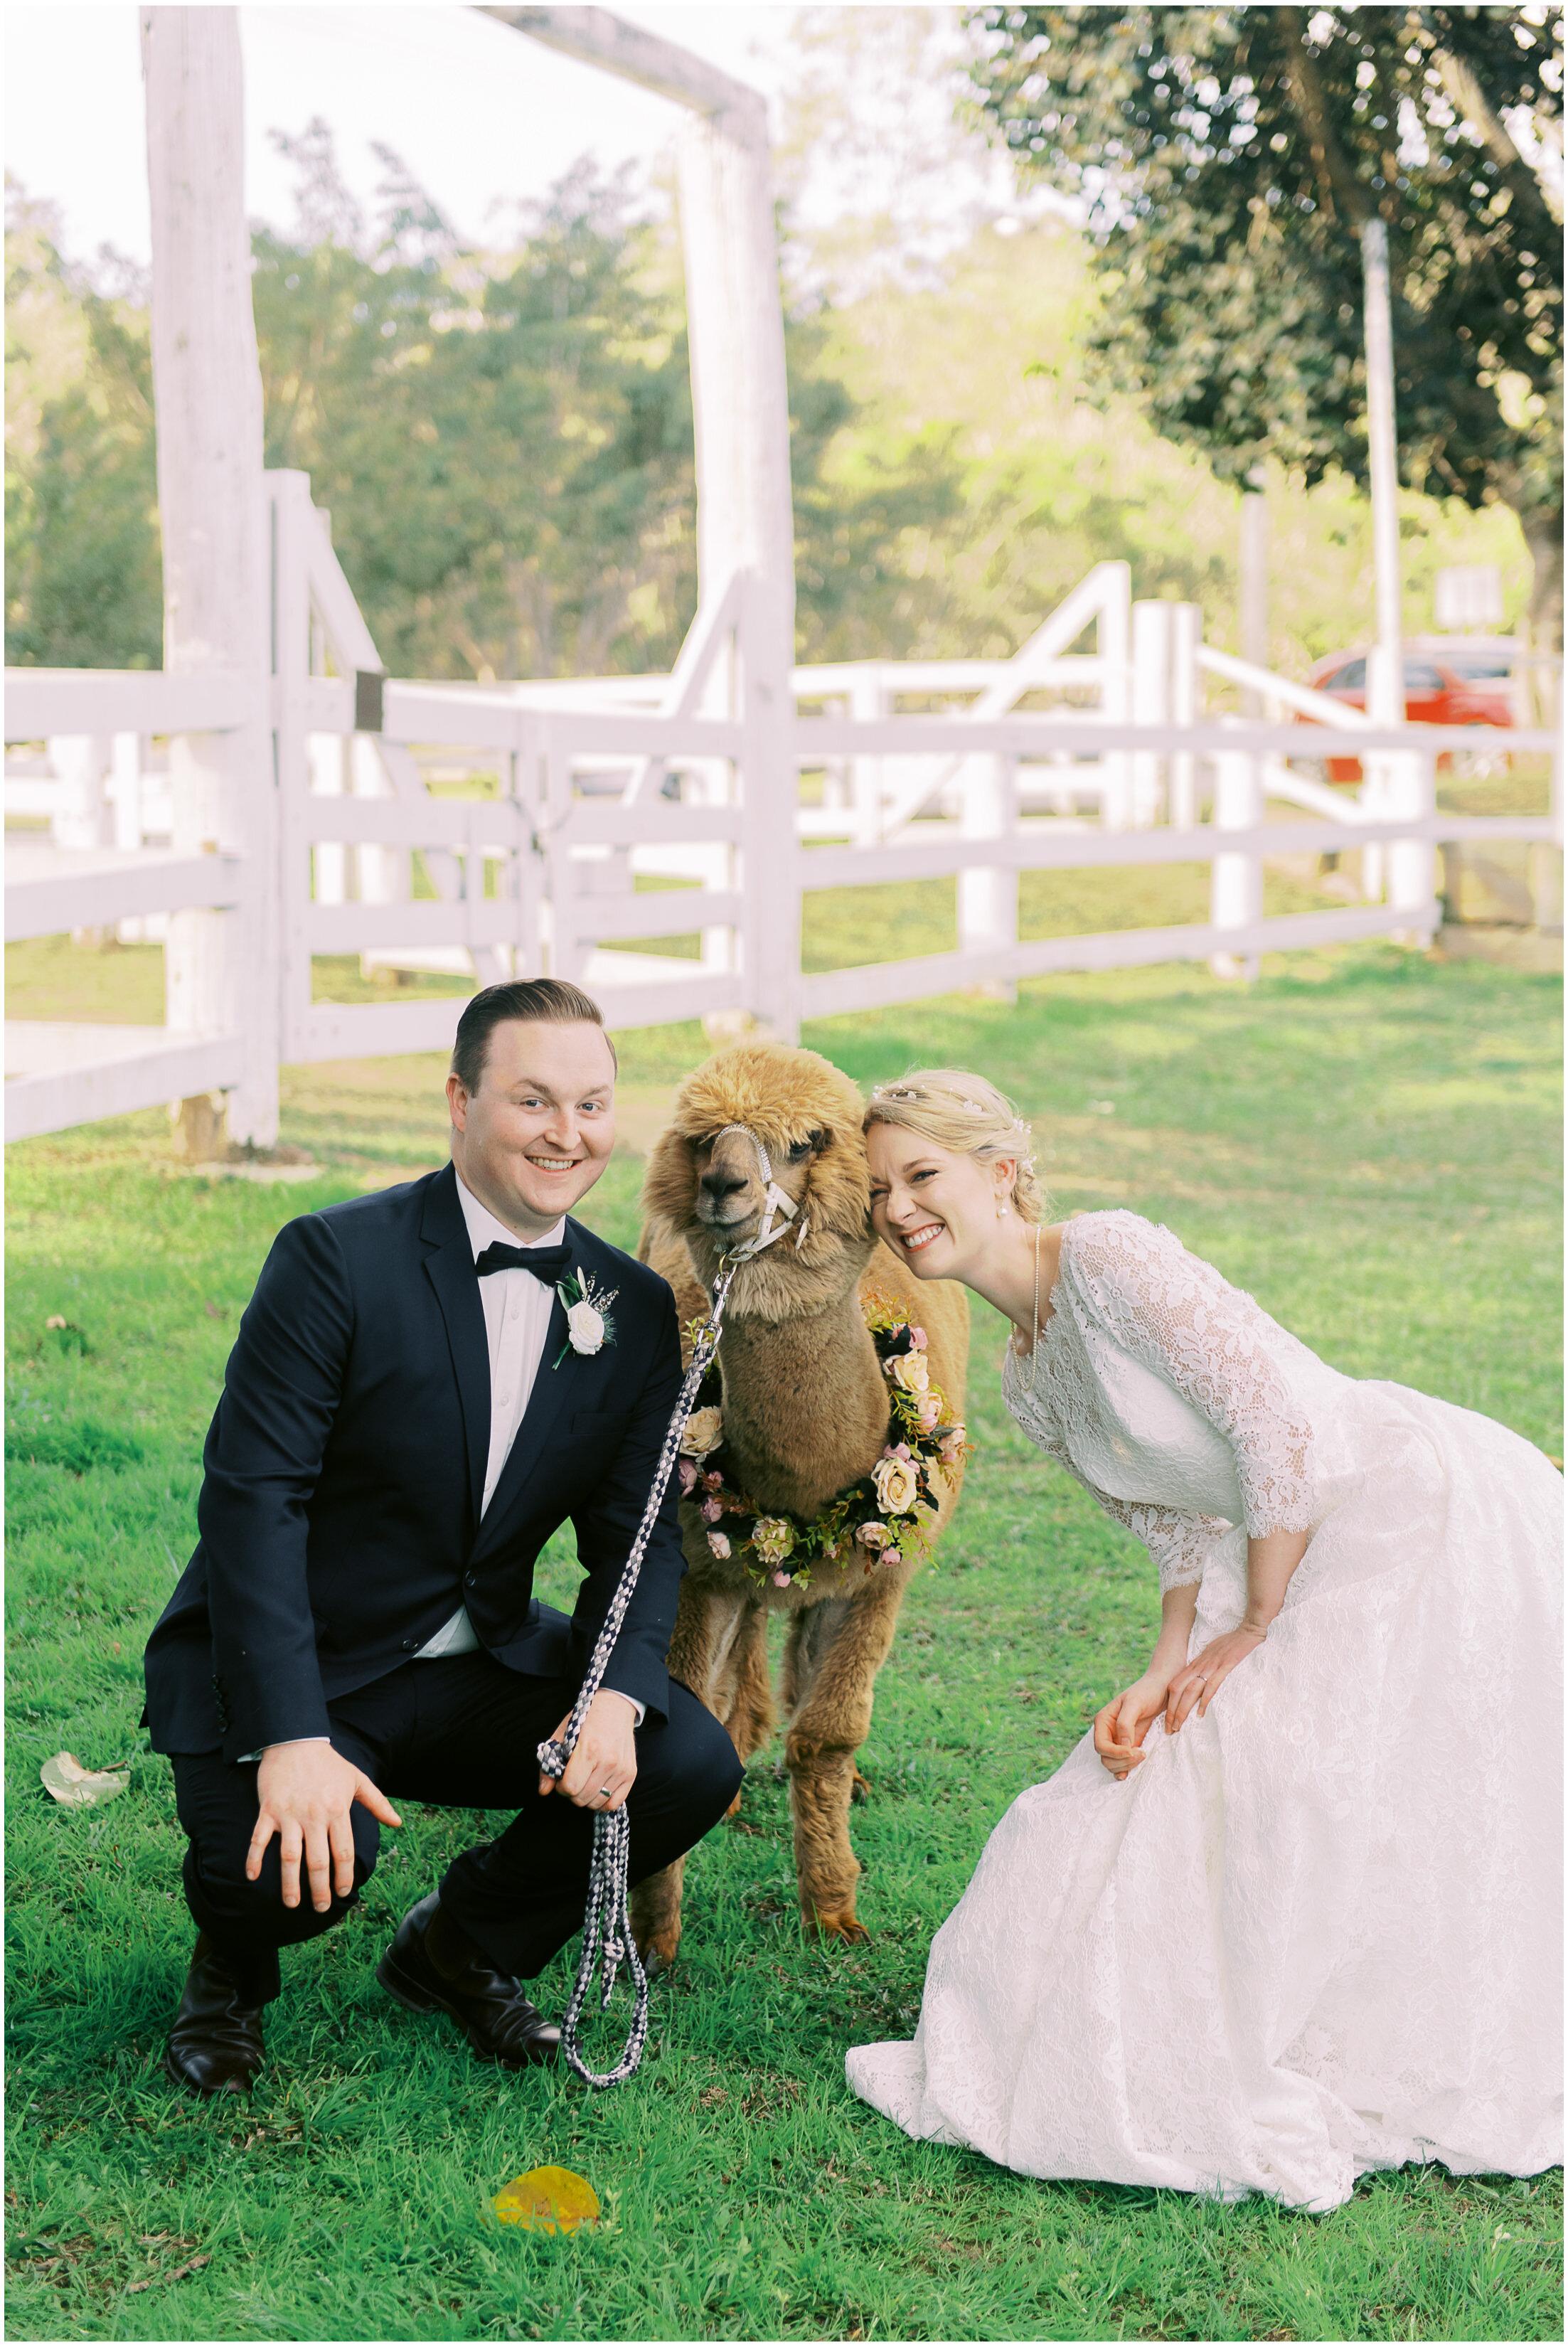 brisbane-fine-art-wedding-photographer-lauren-olivia-luxury-wedding-australia-16.jpg